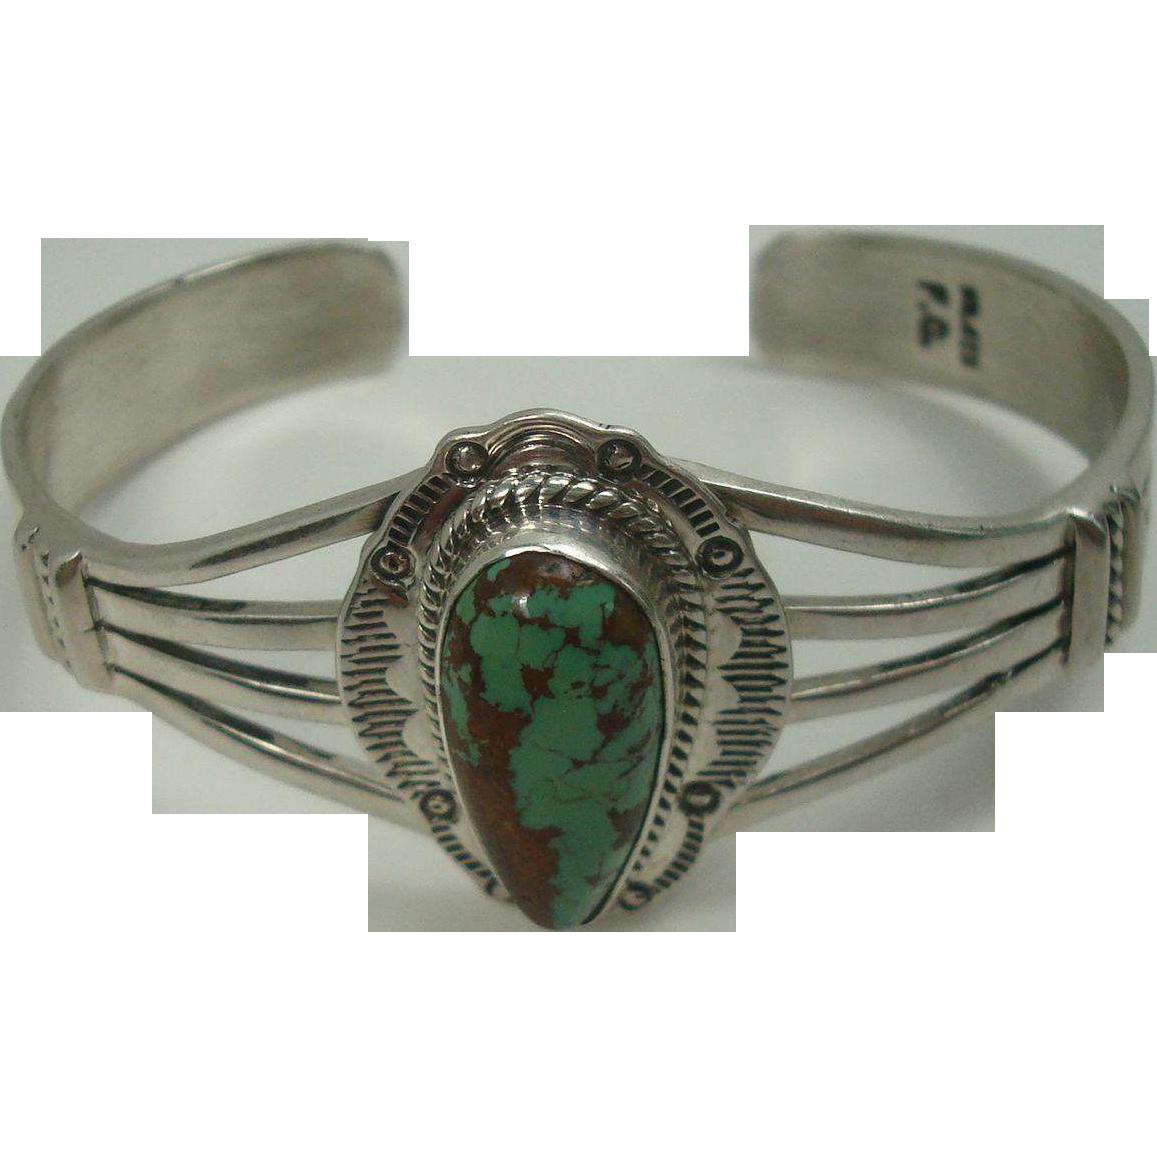 Signed Zuni Green Turquoise Cuff Bracelet